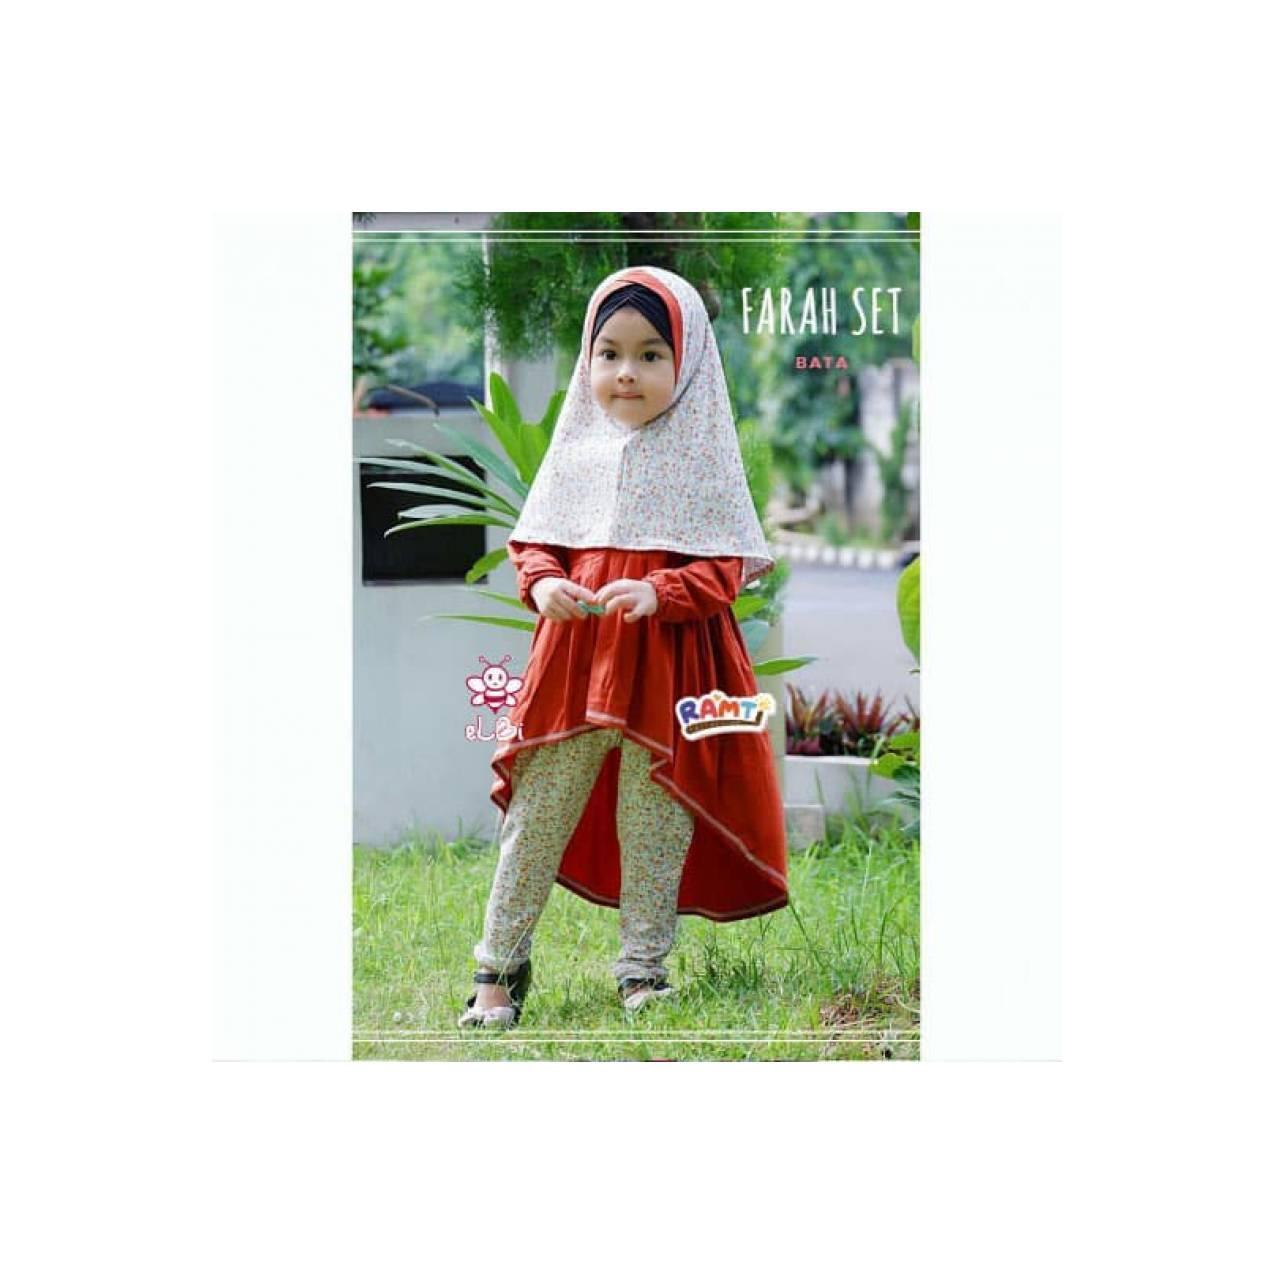 hijab anak cantik I jual baju muslim bayi murah I hijab anak I Farah